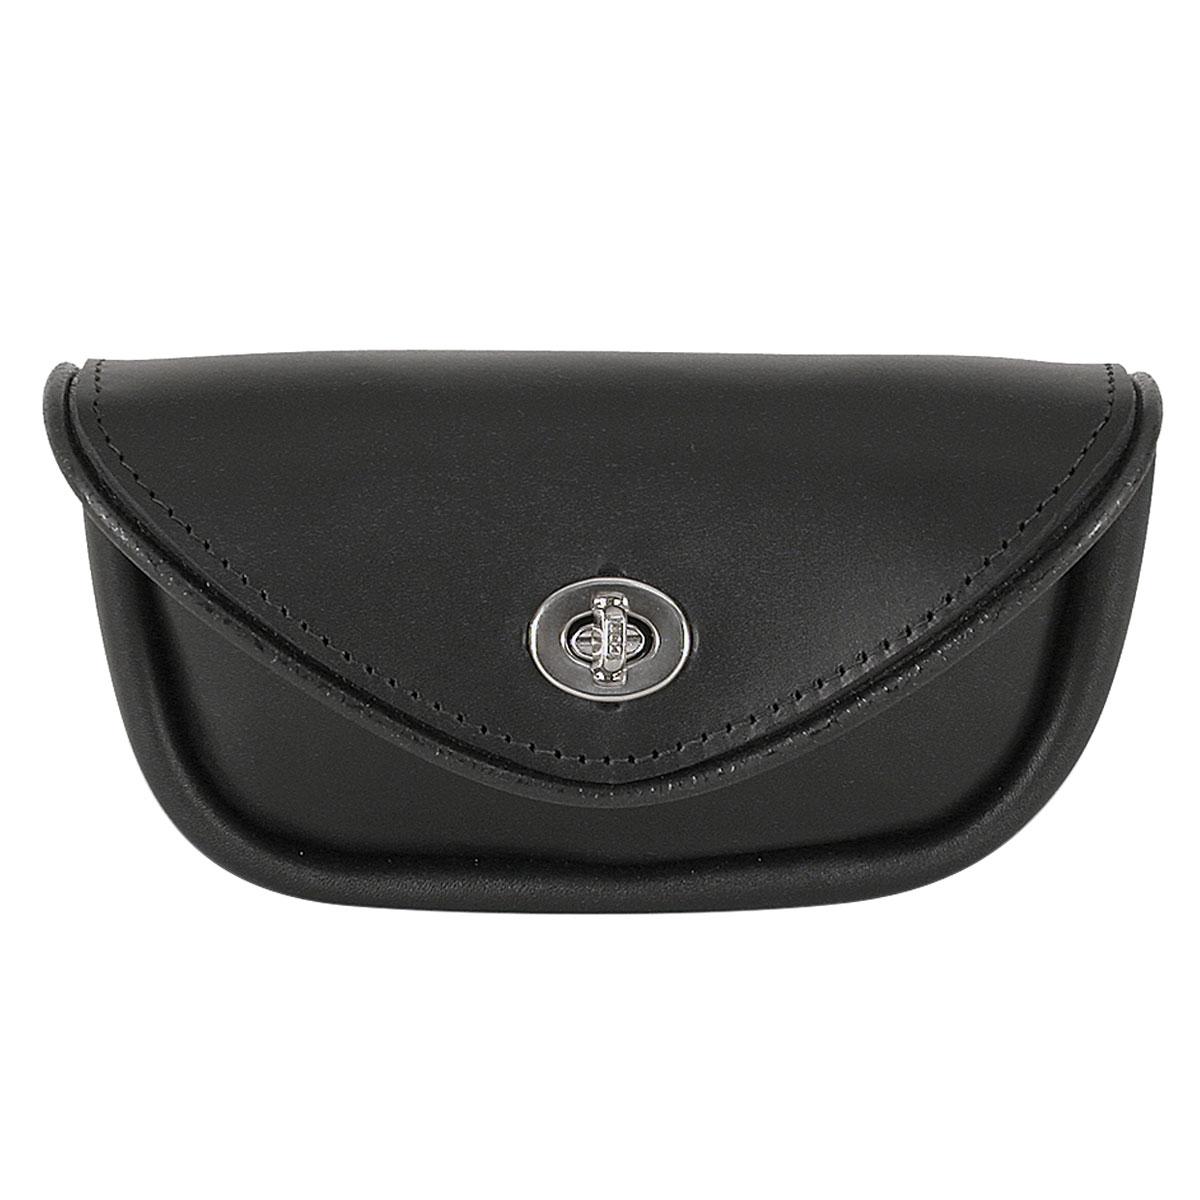 Leatherworks, Inc. Handlebar Bag